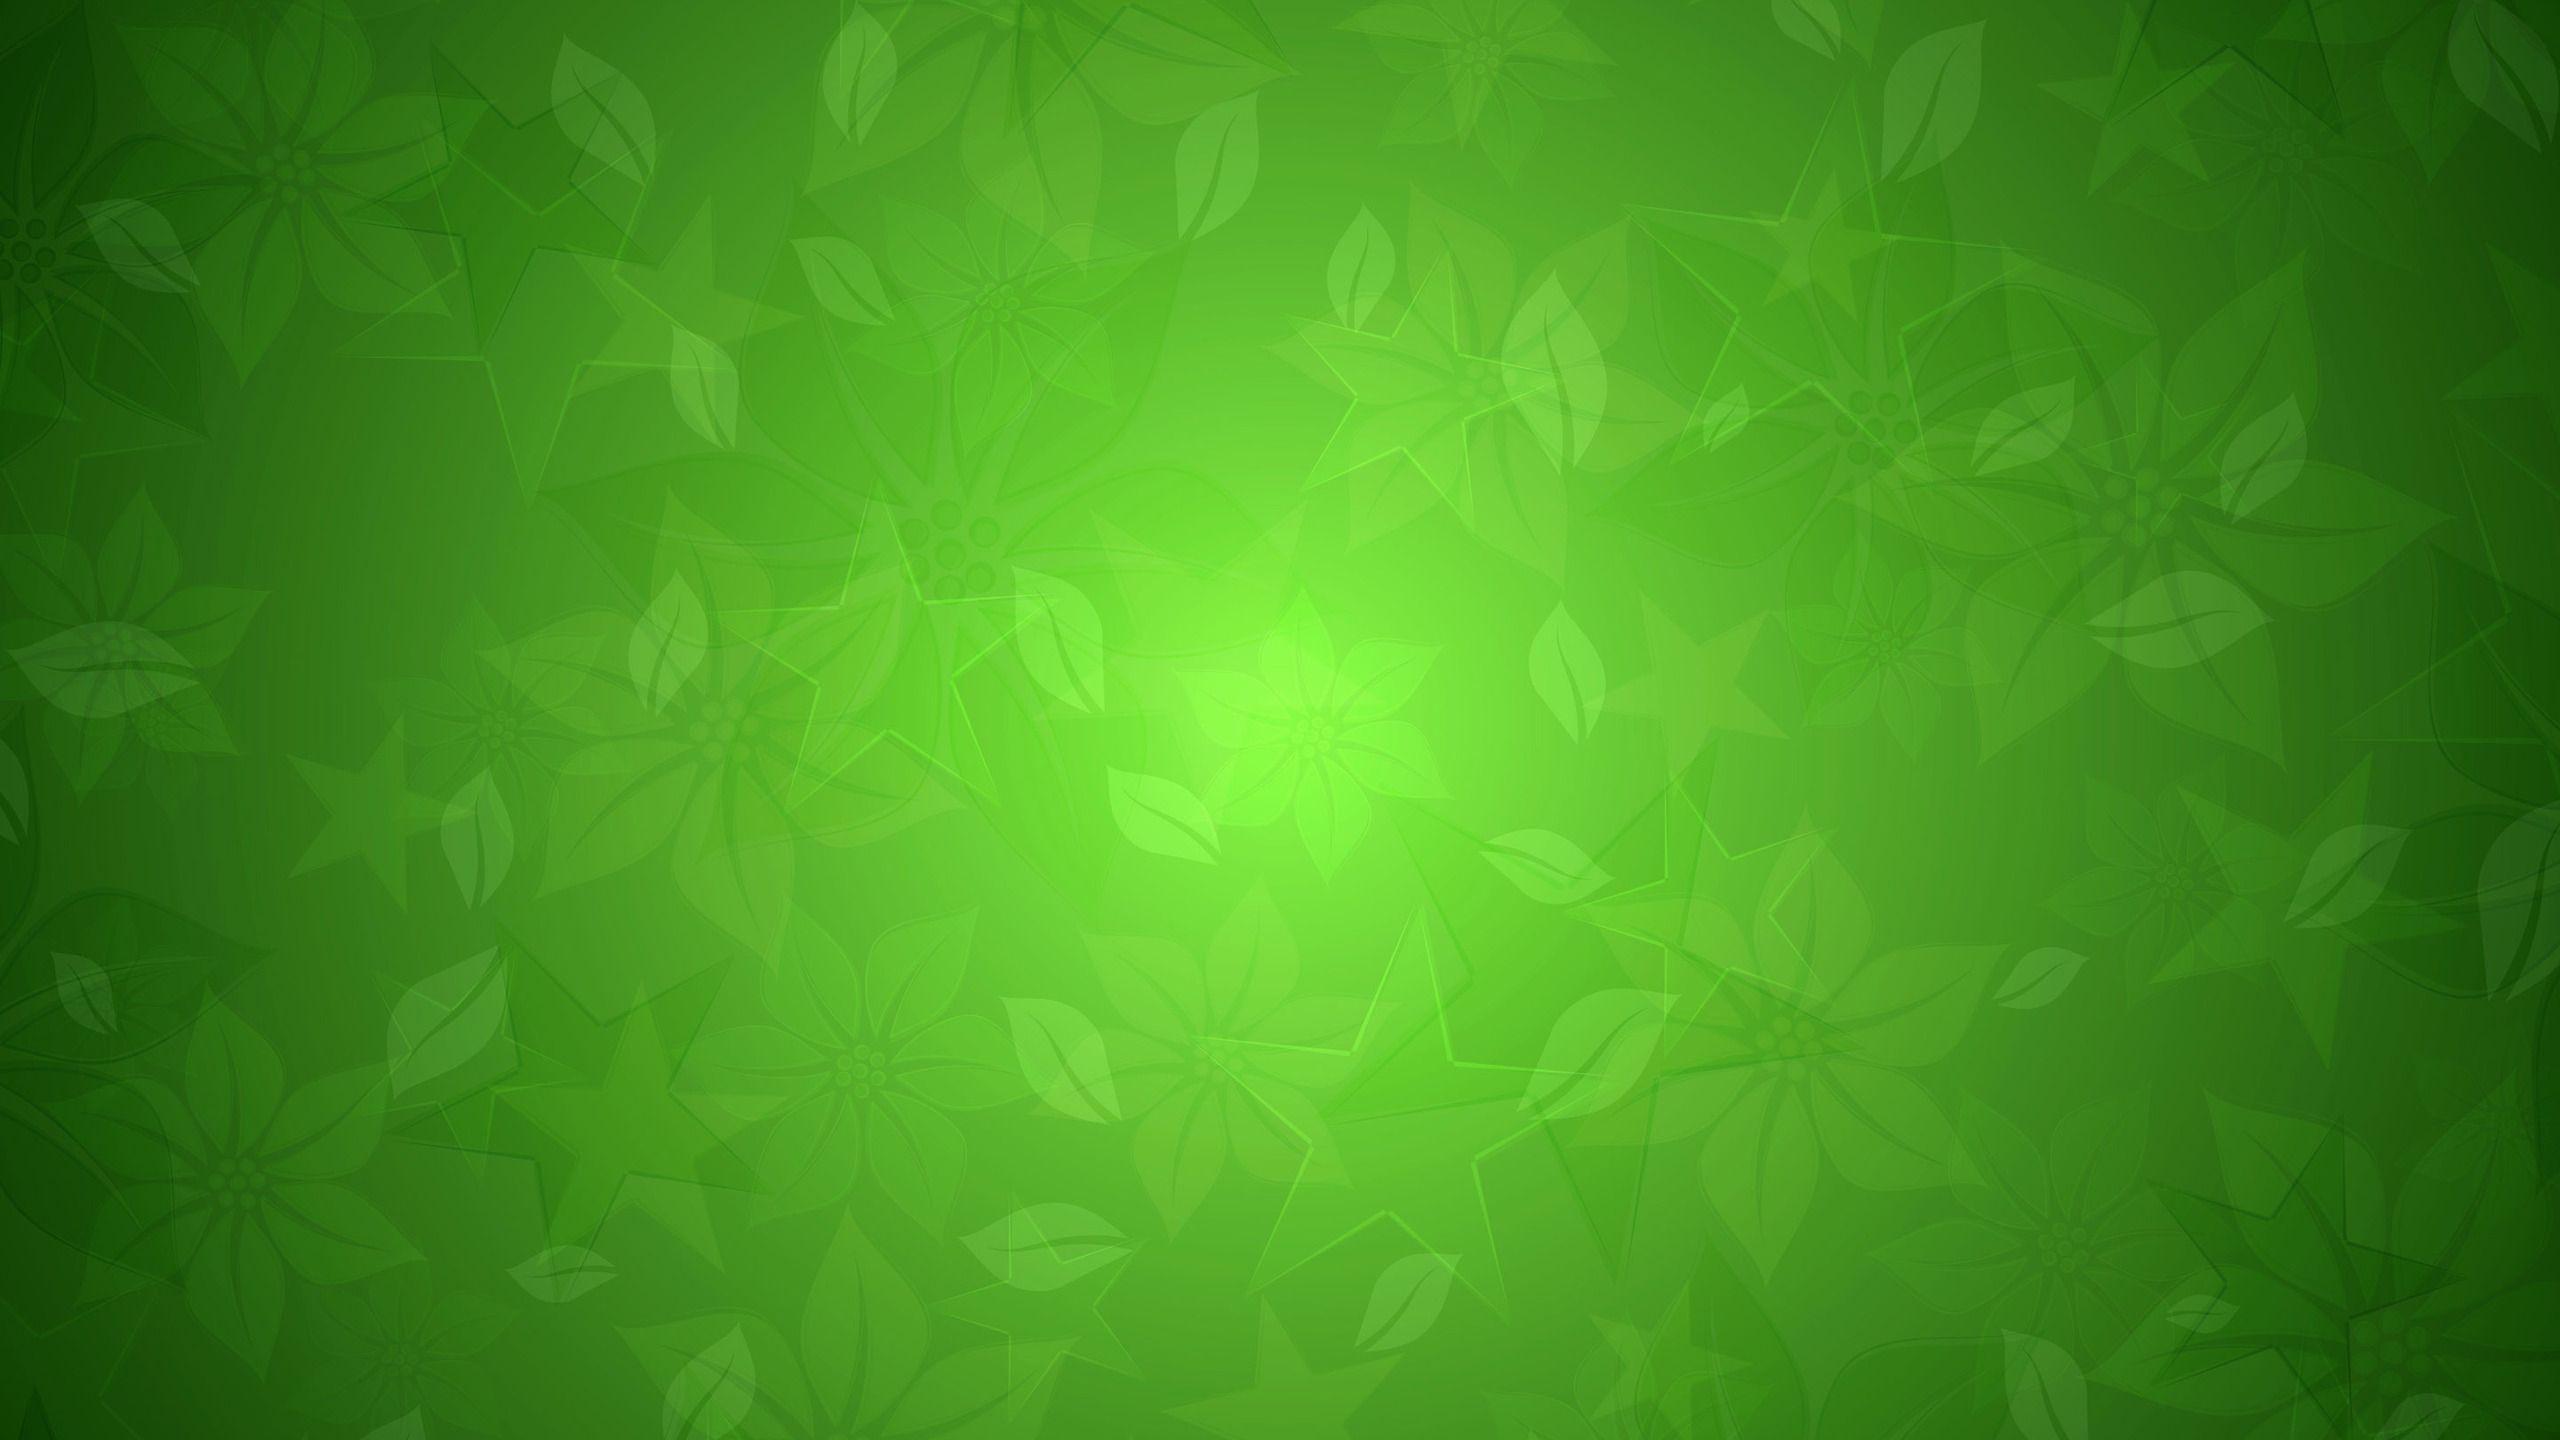 Green Draw Online Hd Wallpapers Dark Green Wallpaper Green Wallpaper Green Texture Background Dark green color background wallpaper hd